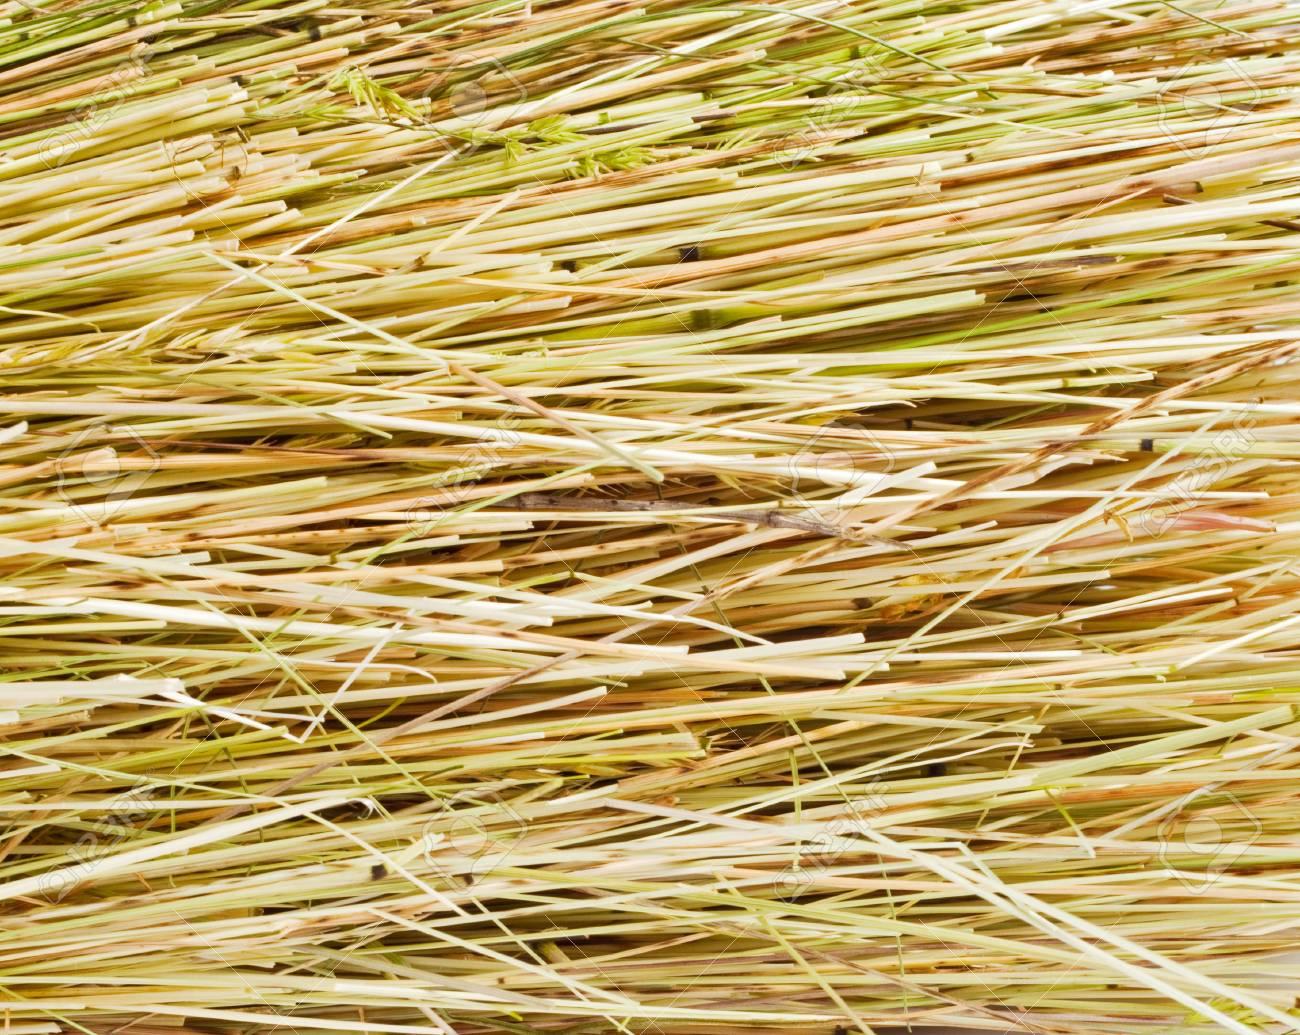 Grunge texture of dry grass Stock Photo - 9740477